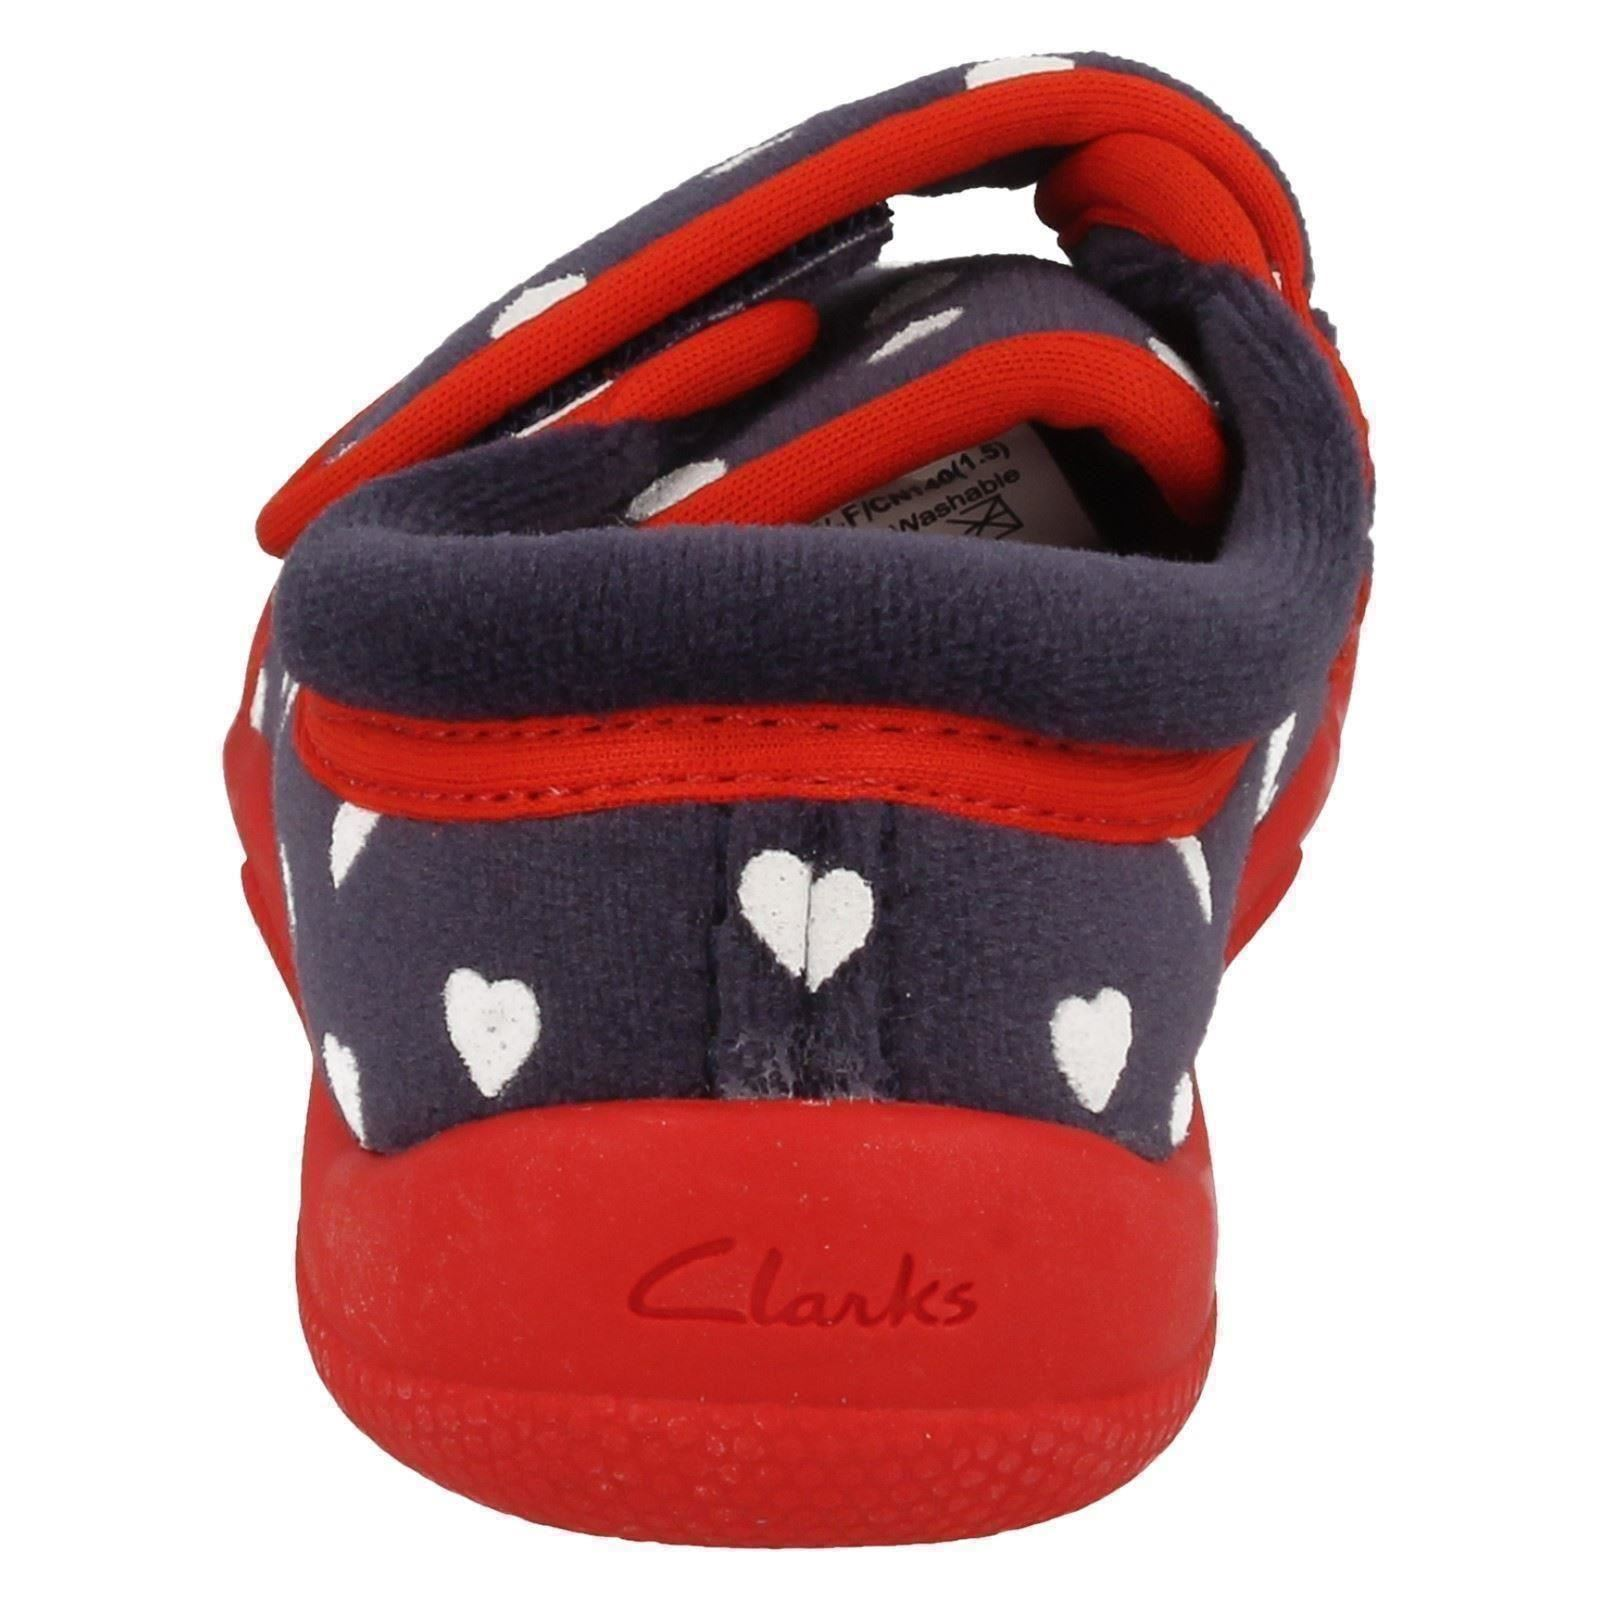 Girls Clarks Heart Print Slippers - Cuba Elle